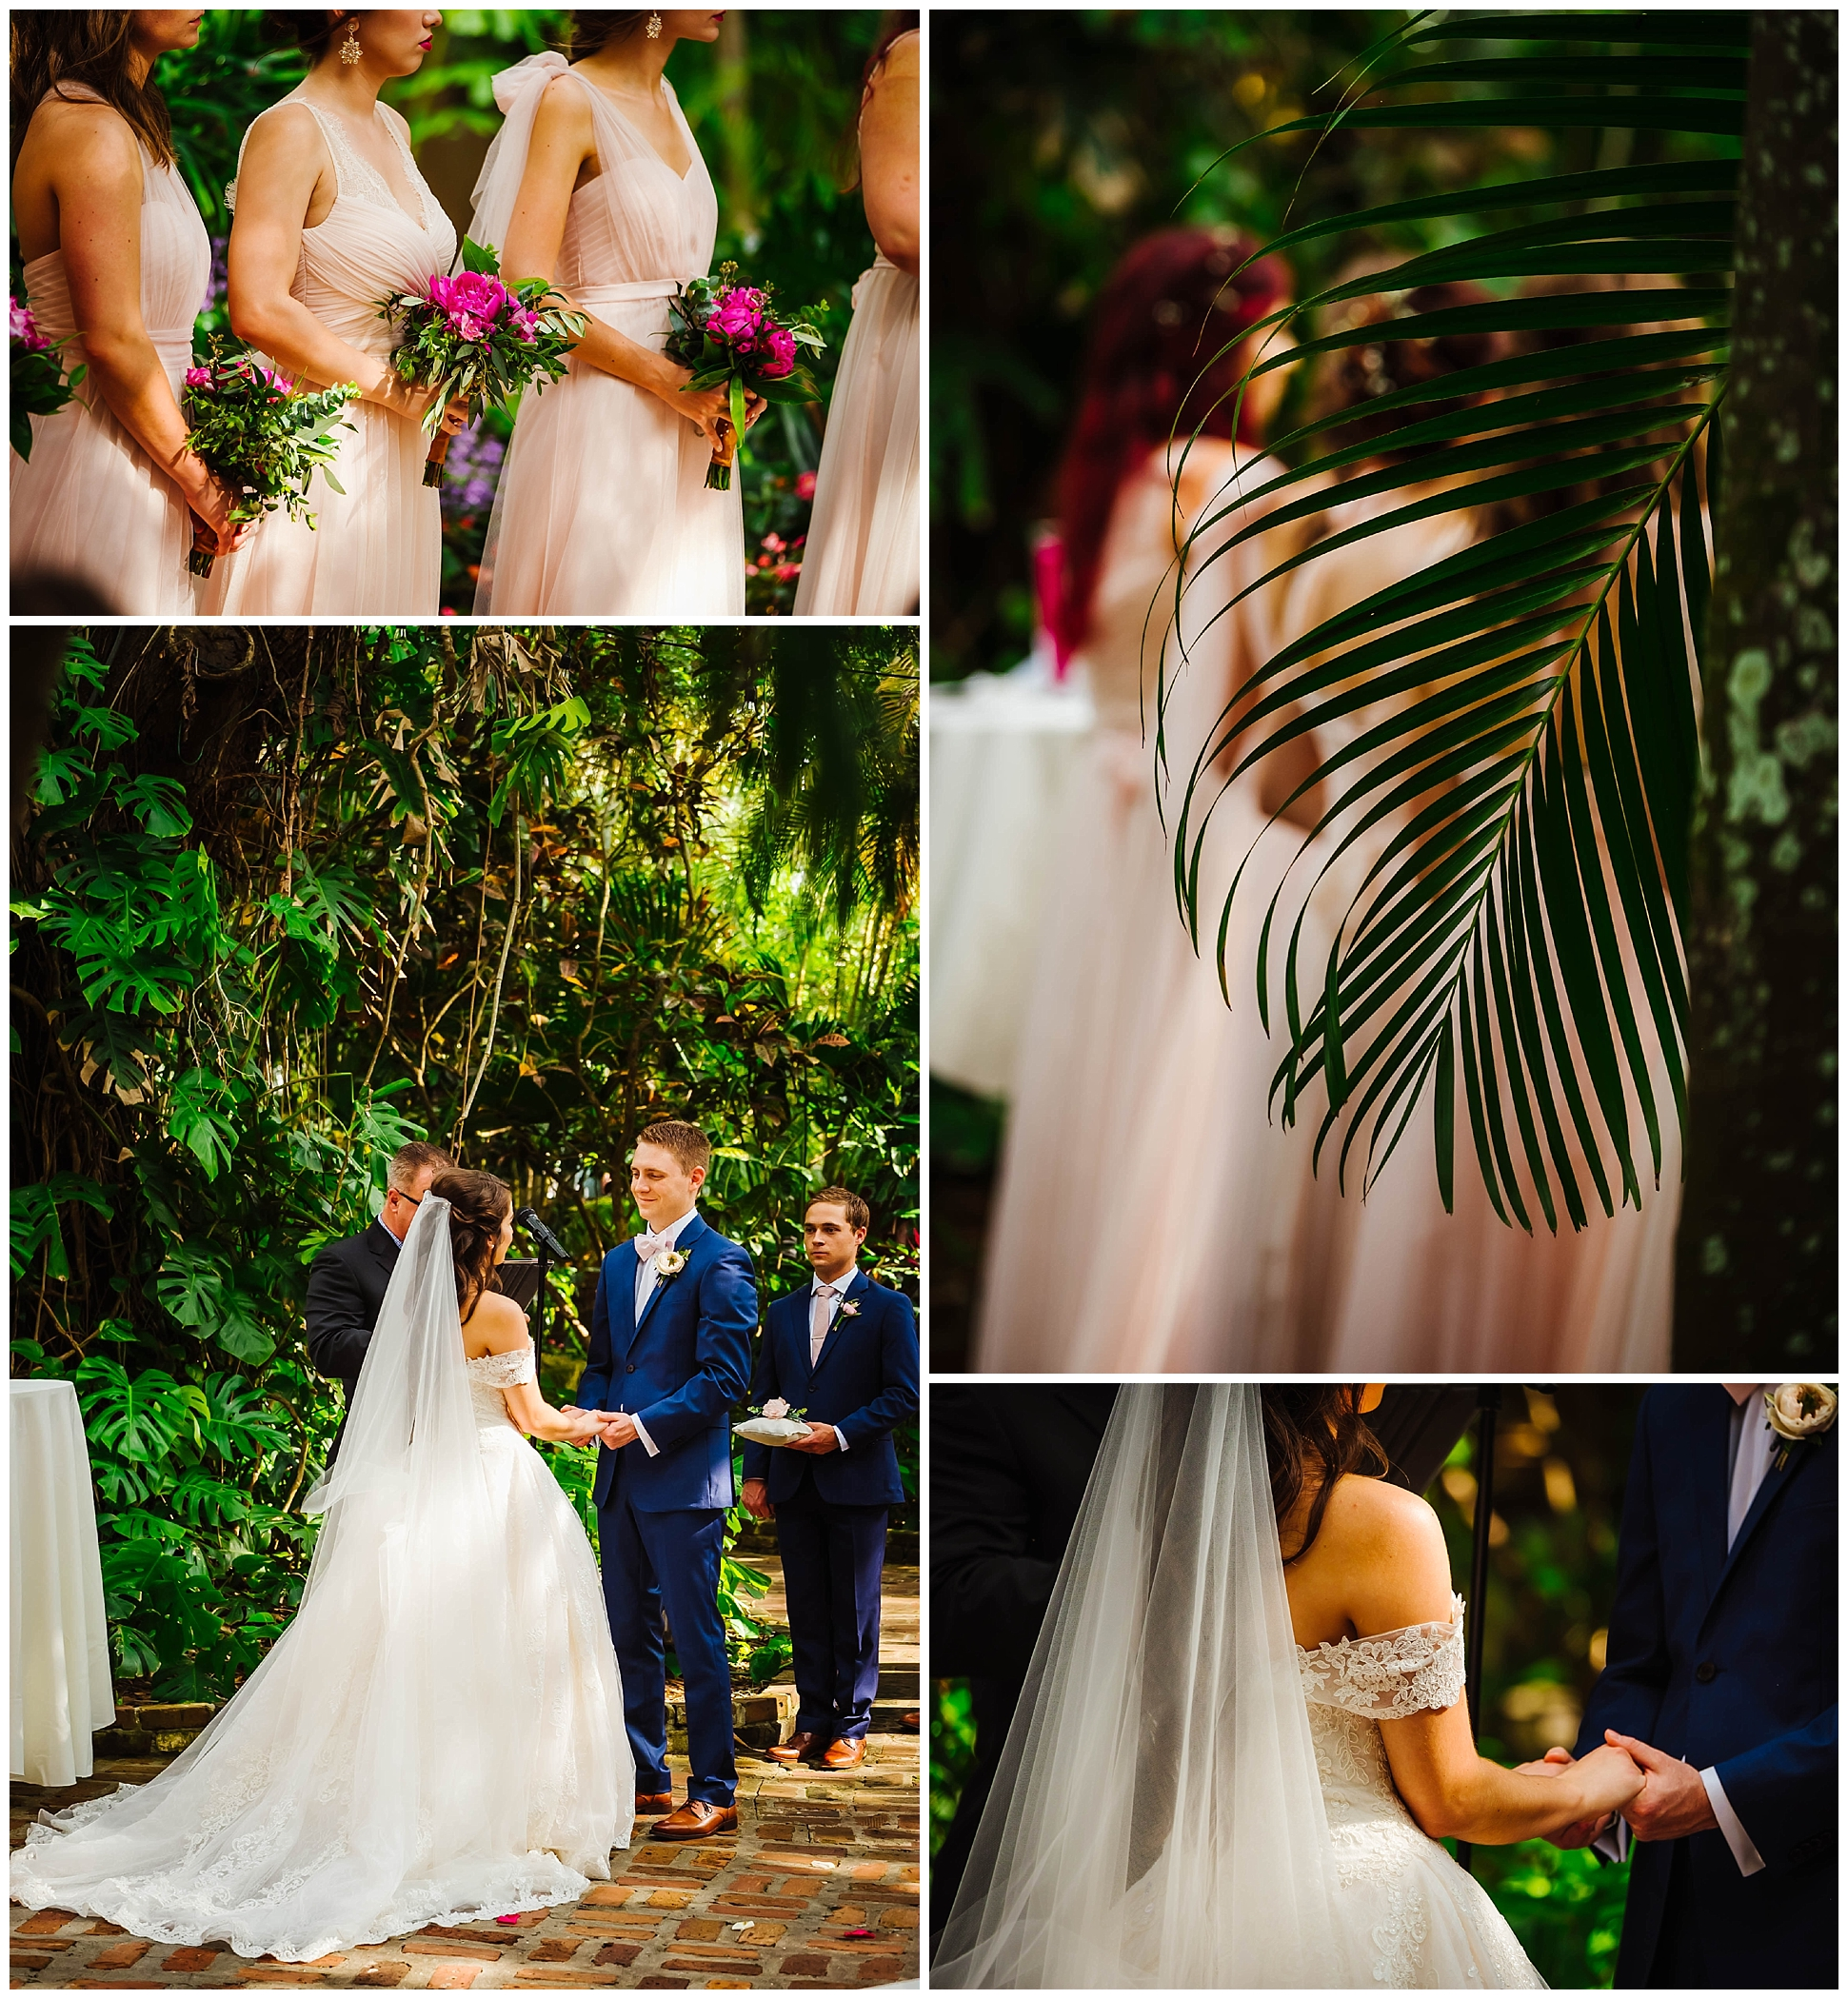 st-pete-wedding-photographer-sunken-gardens-crystal-ballroom-princess-dancer_0155.jpg